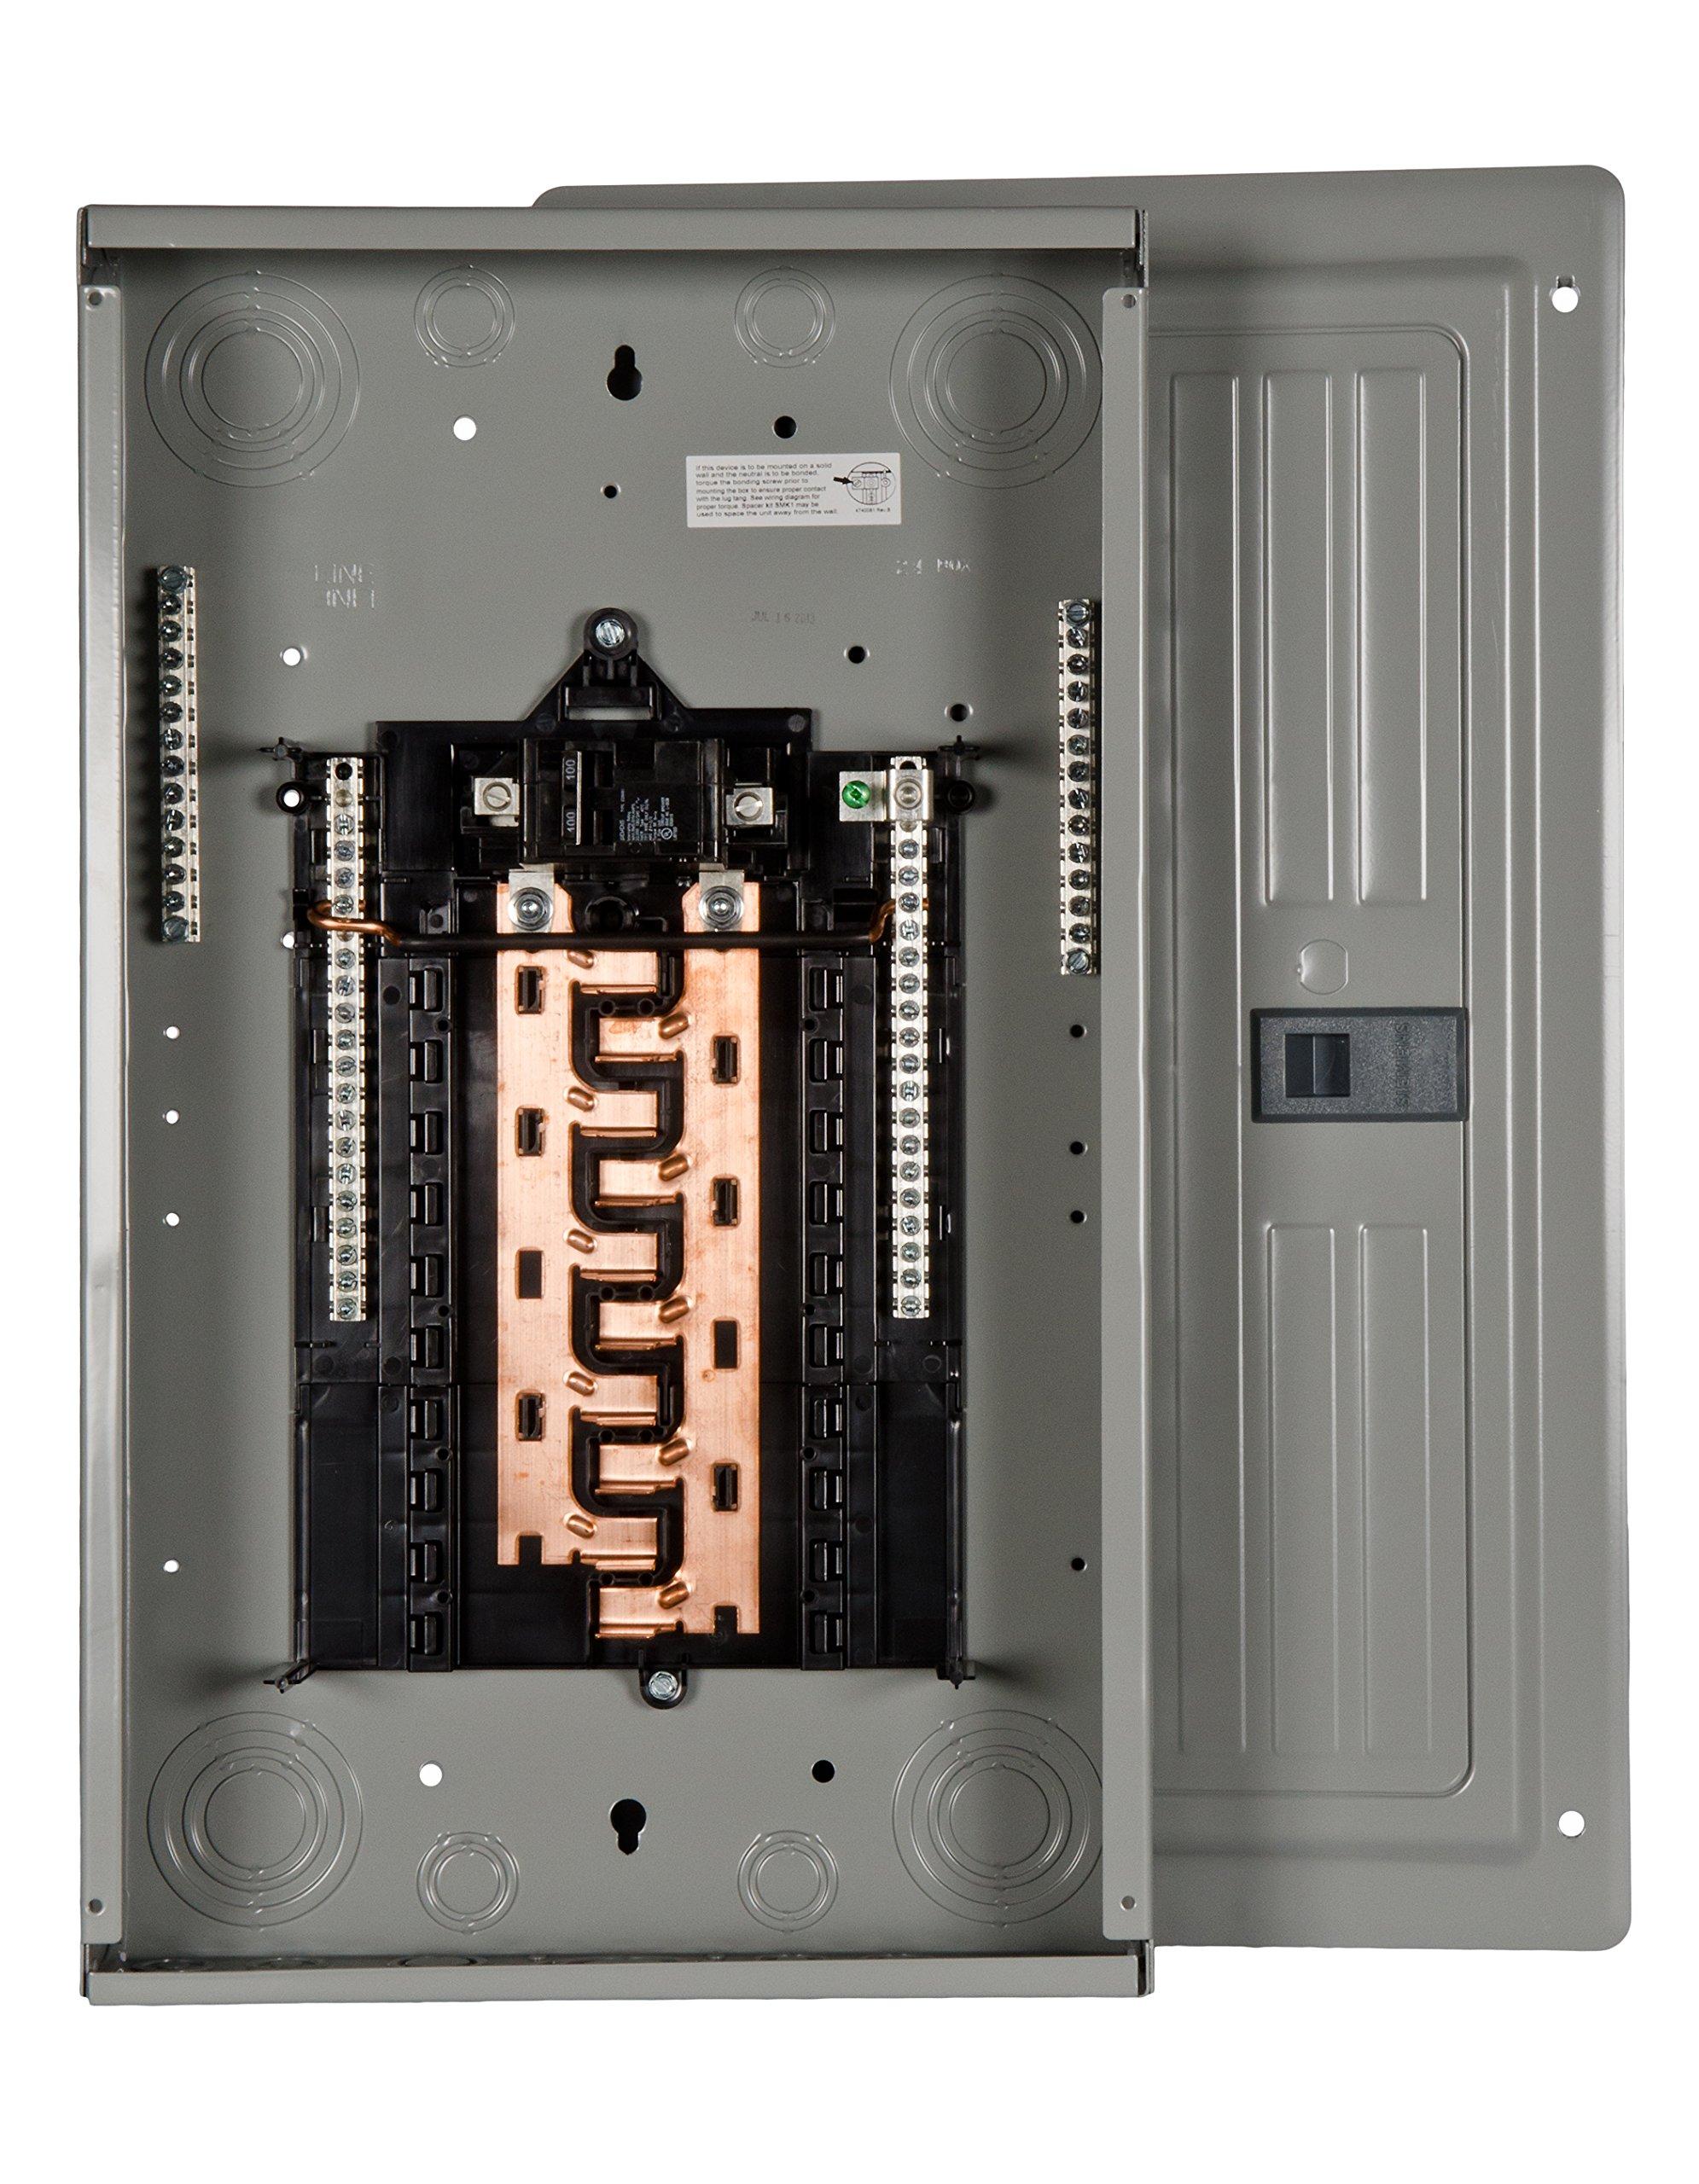 P2020B1100CU 100-Amp 20-Space 20-Circuit Main Breaker Load Center